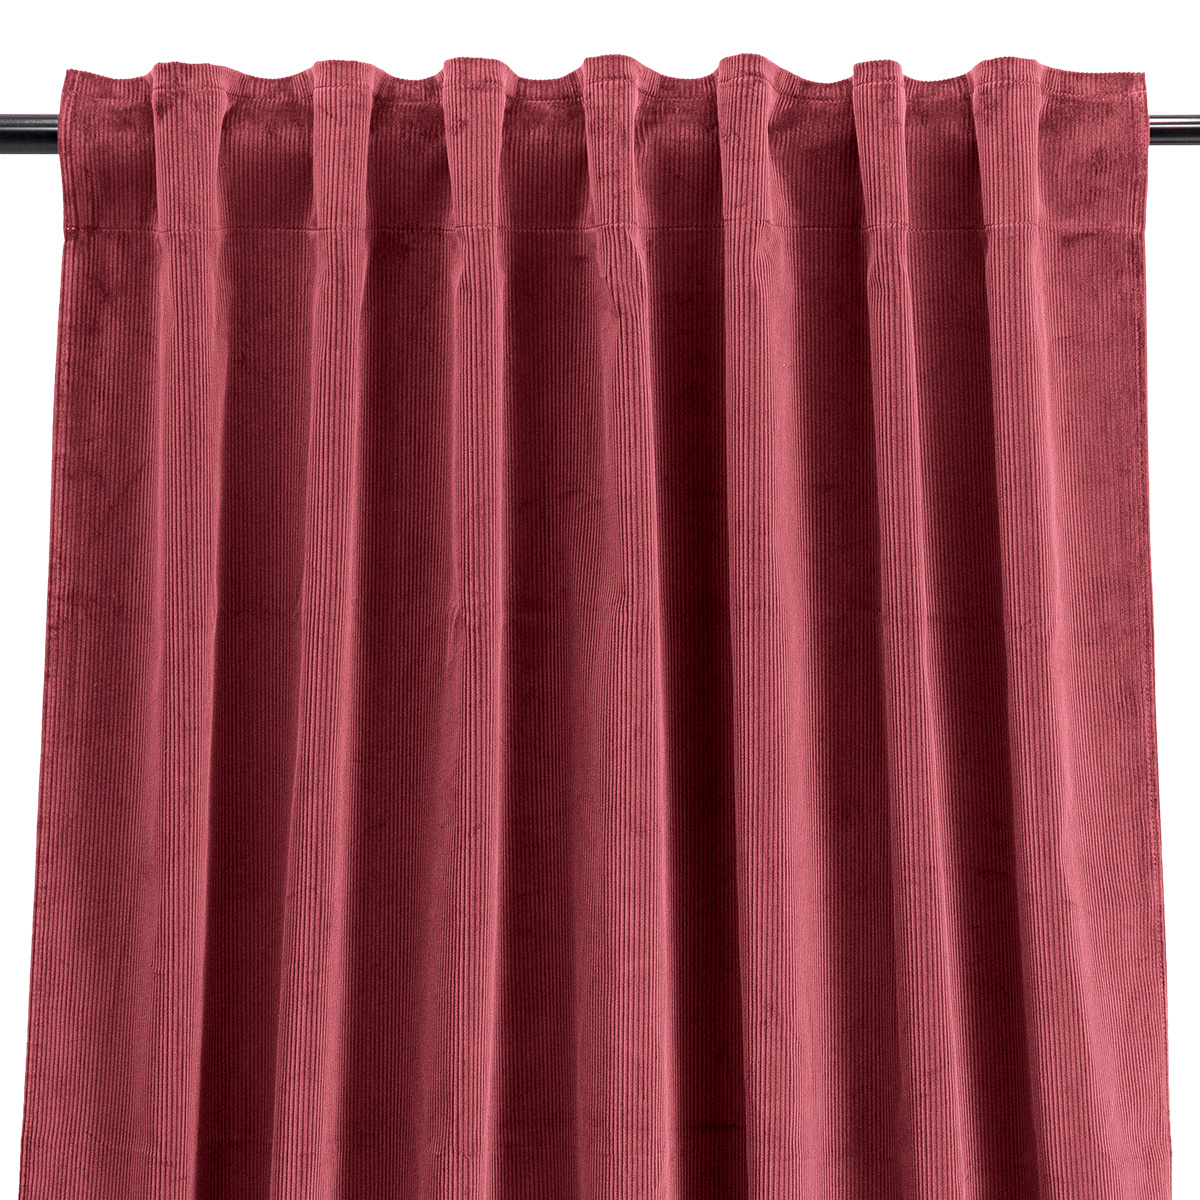 Palazzo Curtain, Pink